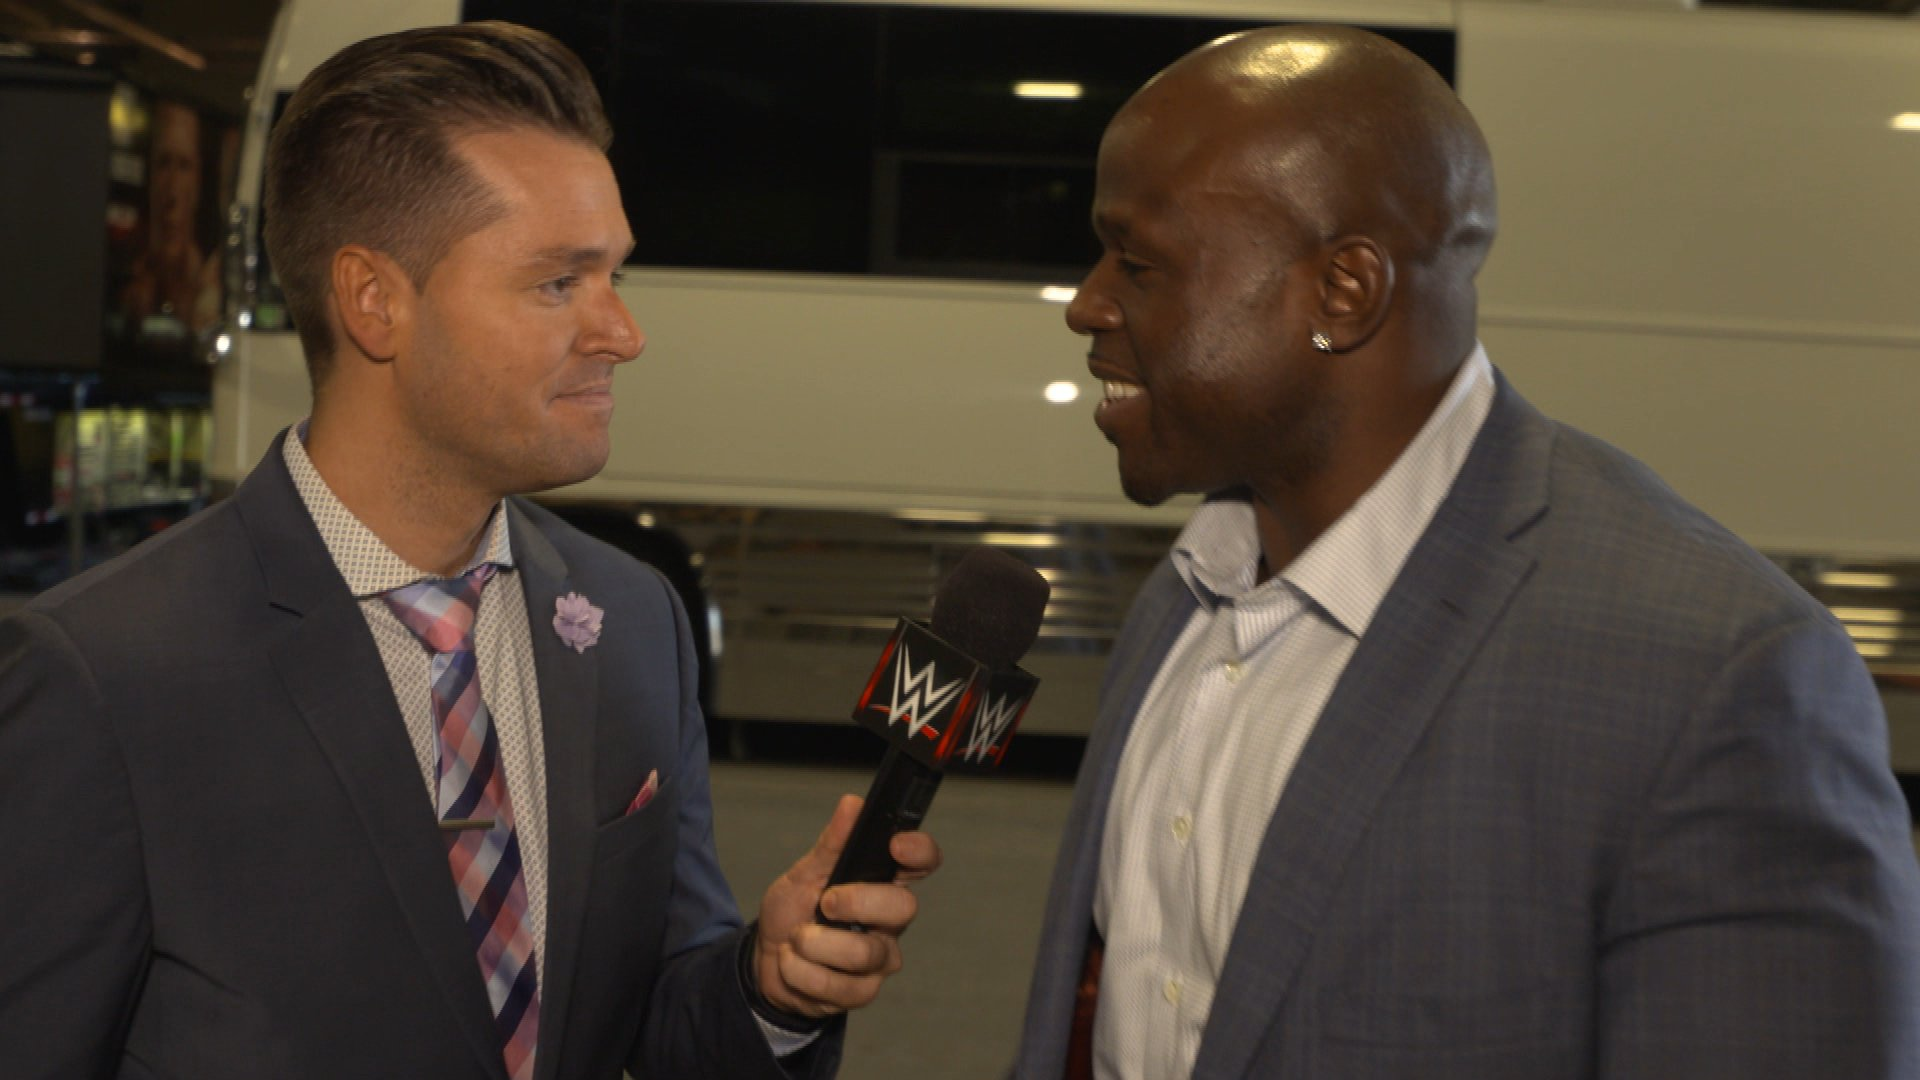 Apollo Crews pojawia się na Raw: WWE.com Exclusive 10.04.17